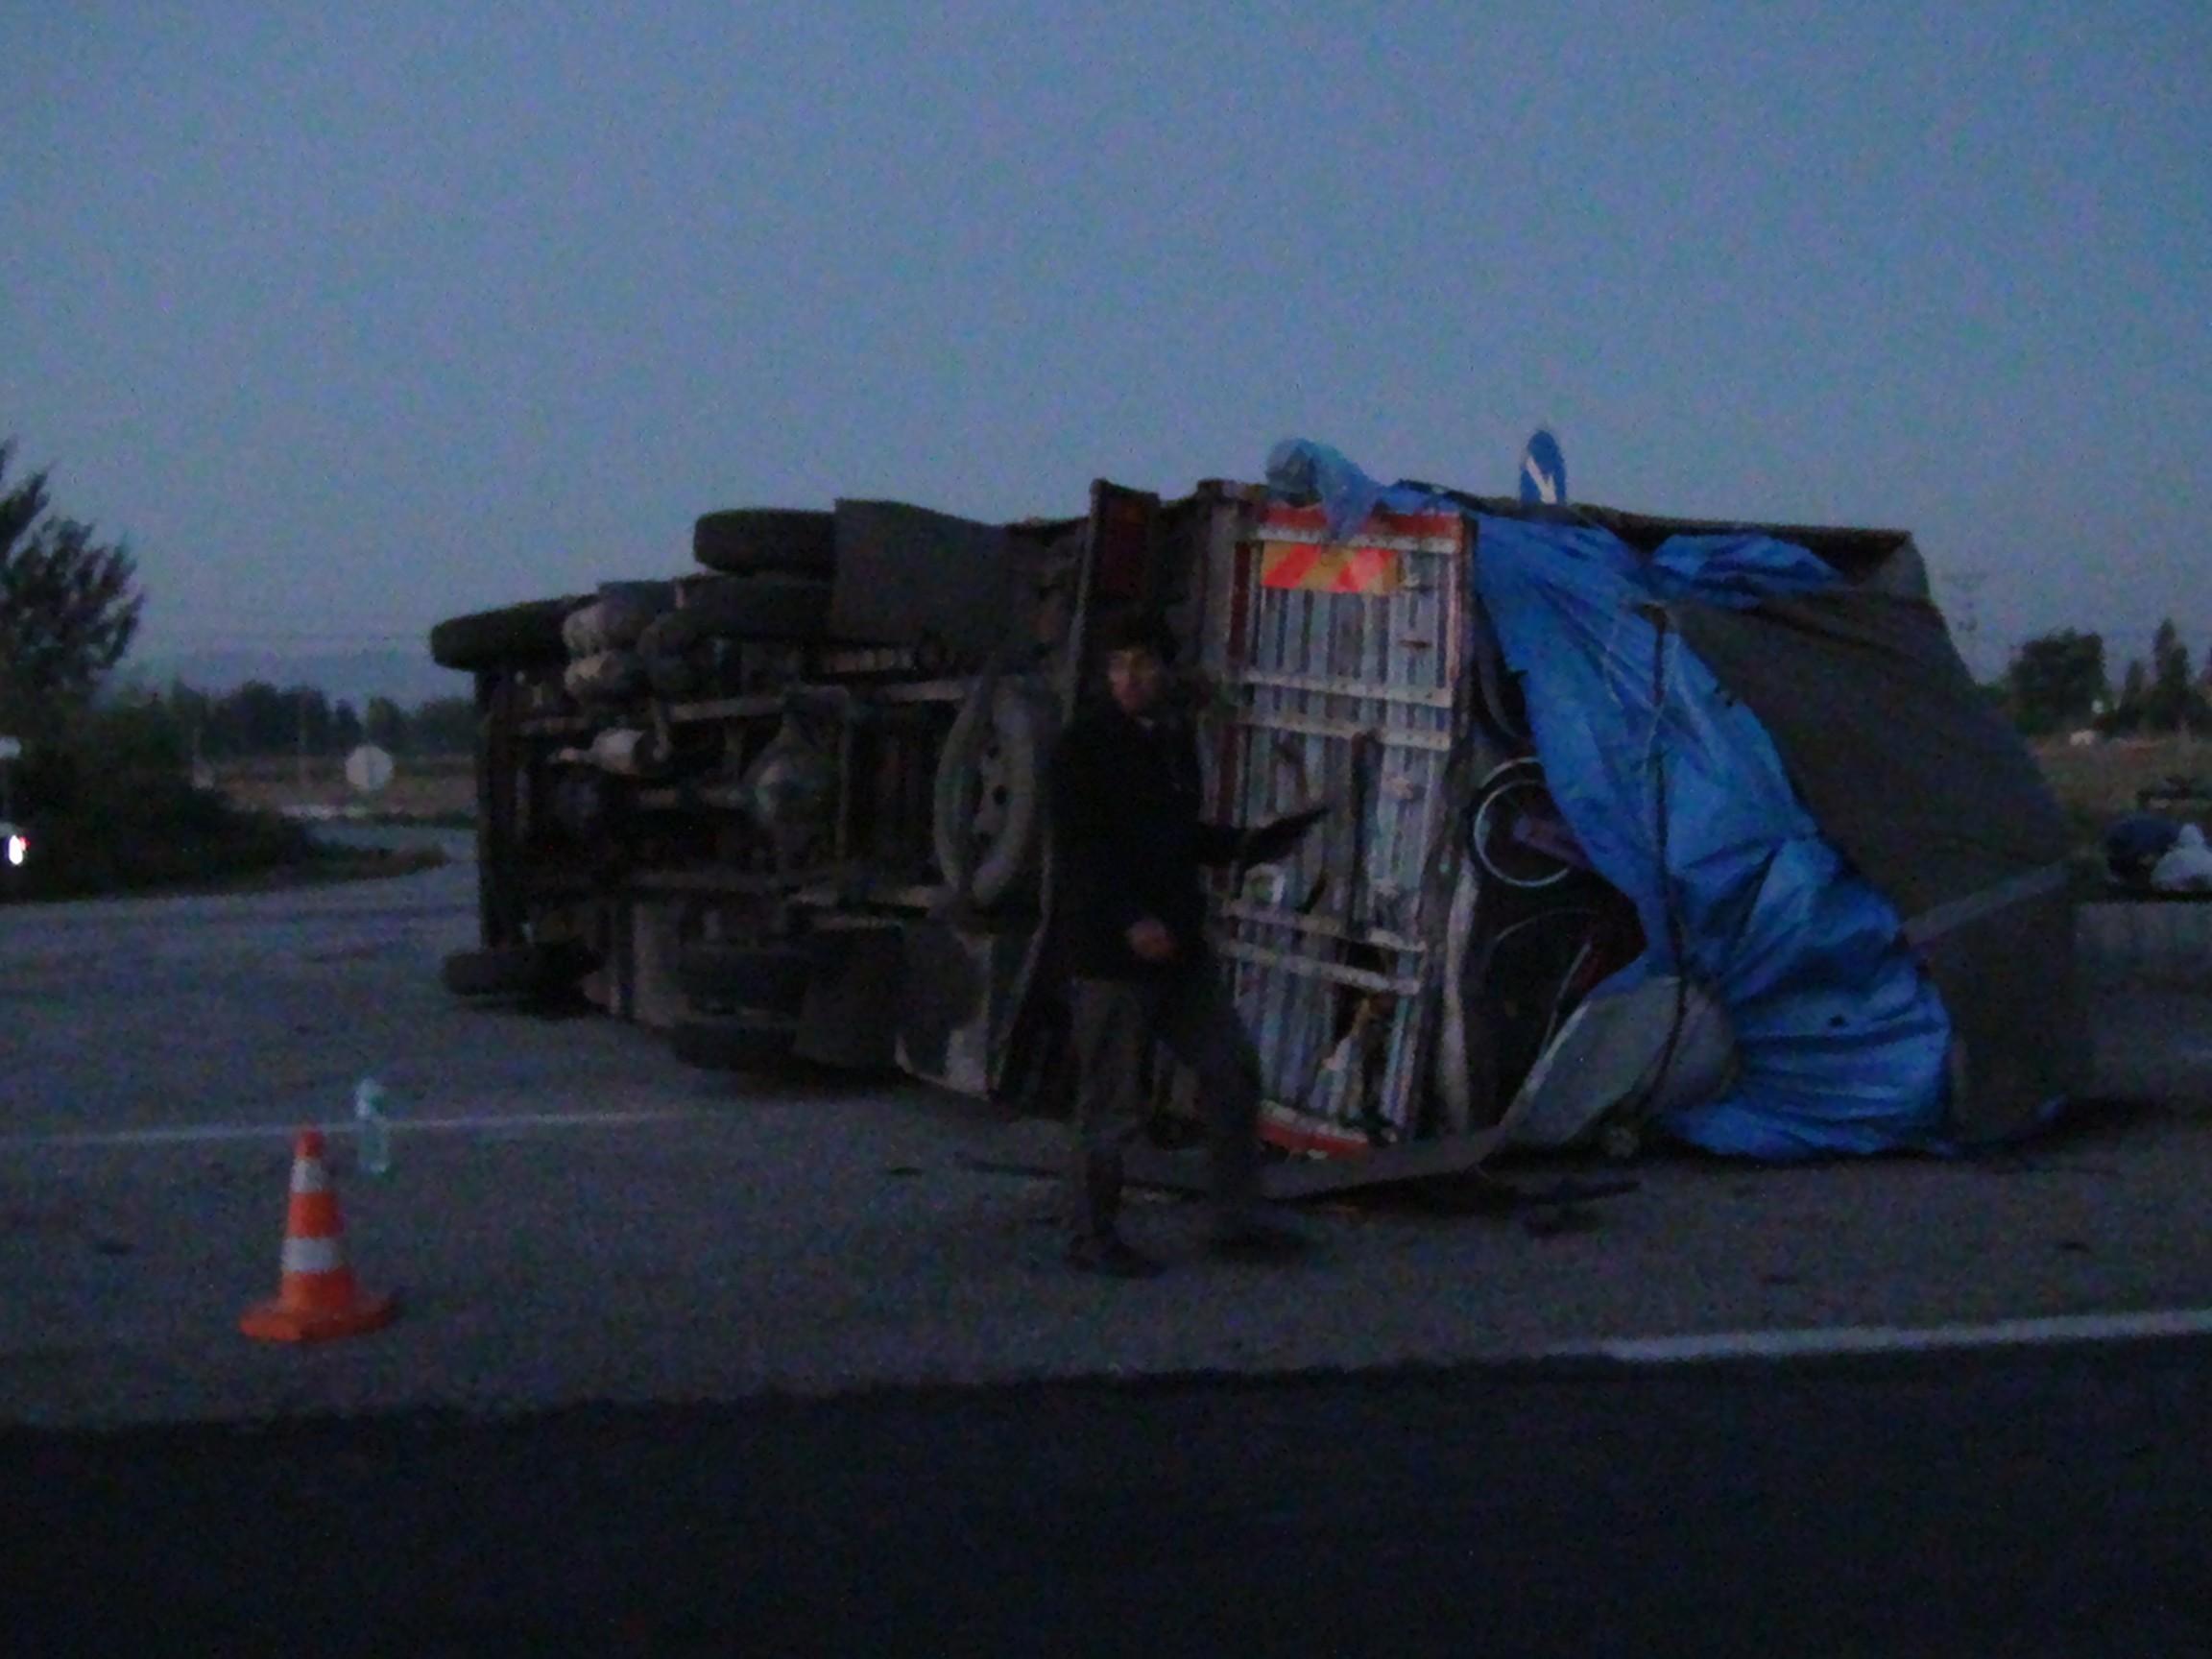 Minibüs kamyonete çarptı: 2 yaralı